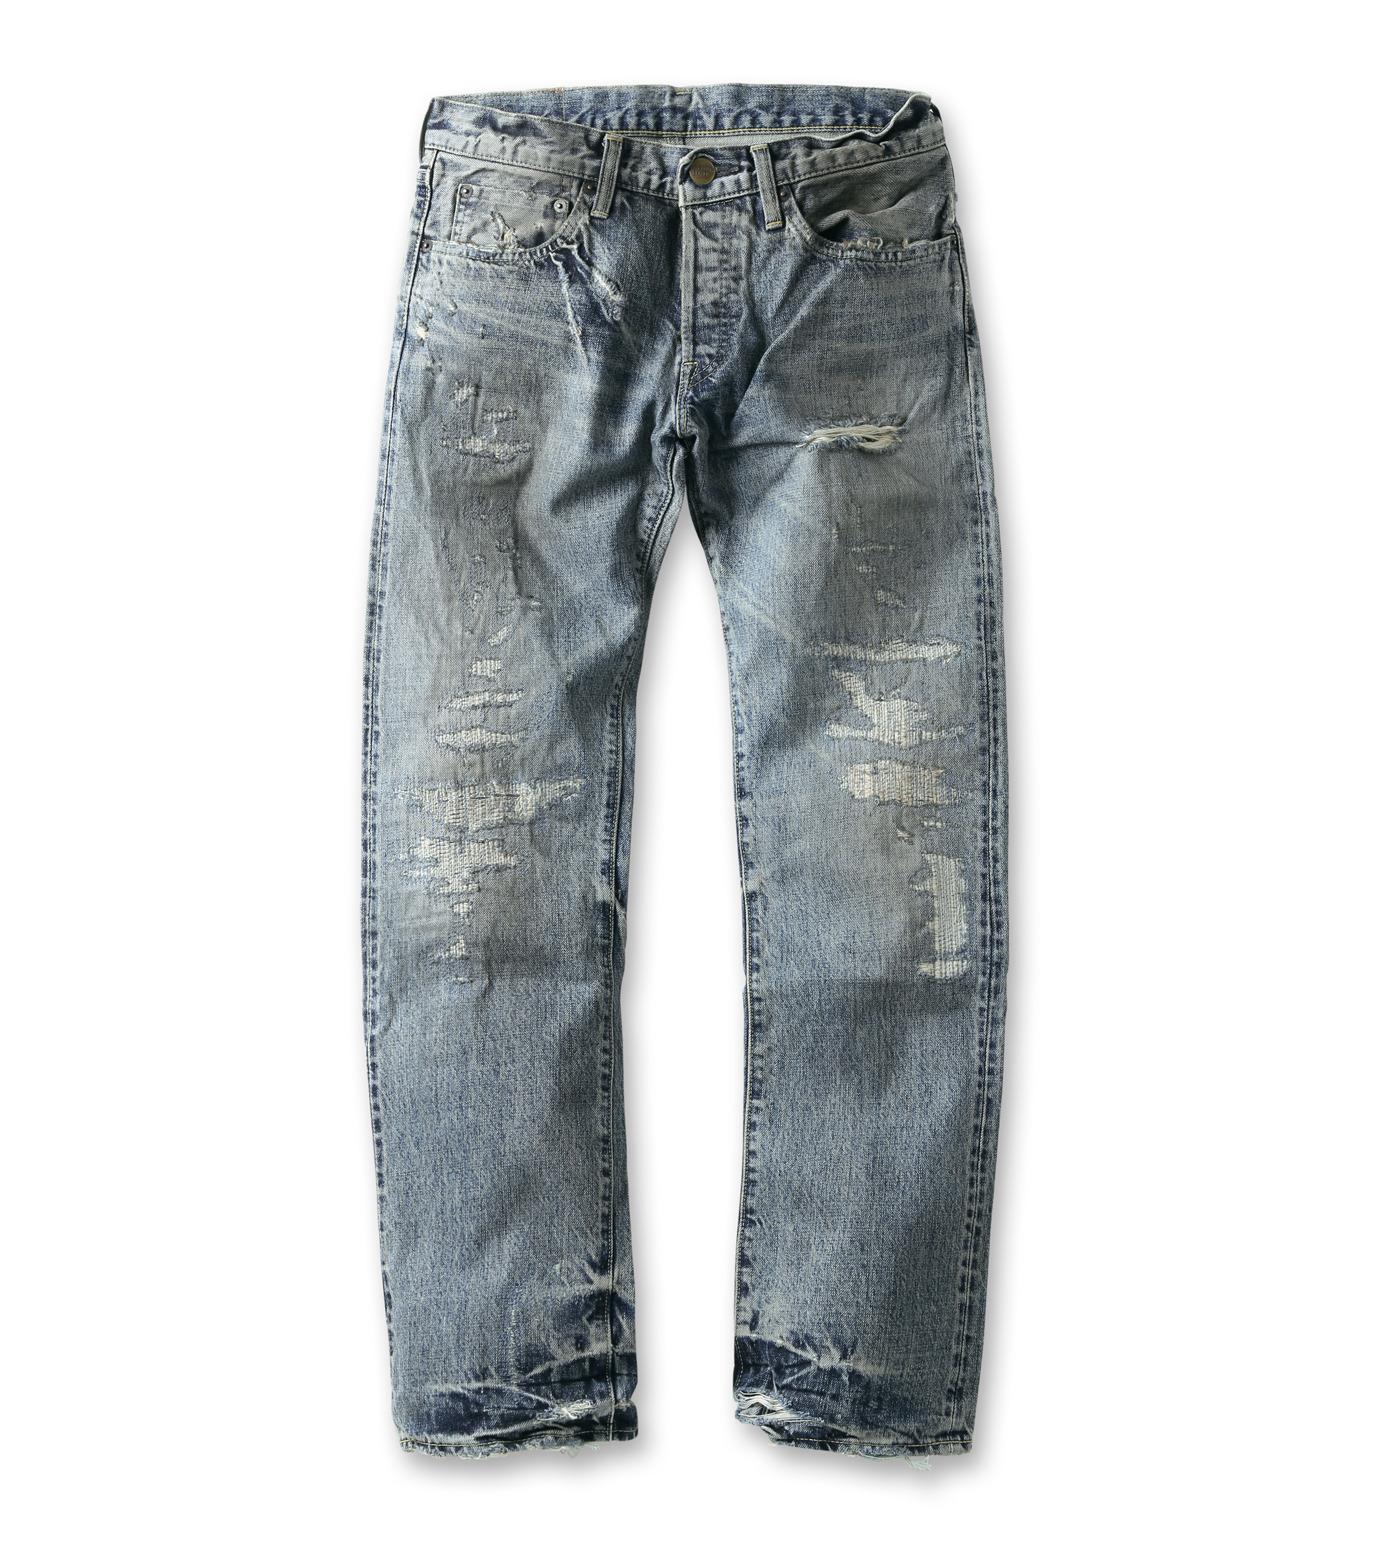 Heddie Lovu(エディー ルーヴ)のALD-CTM-02-BLUE(パンツ/pants)-ALD-CTM-02-92 拡大詳細画像1